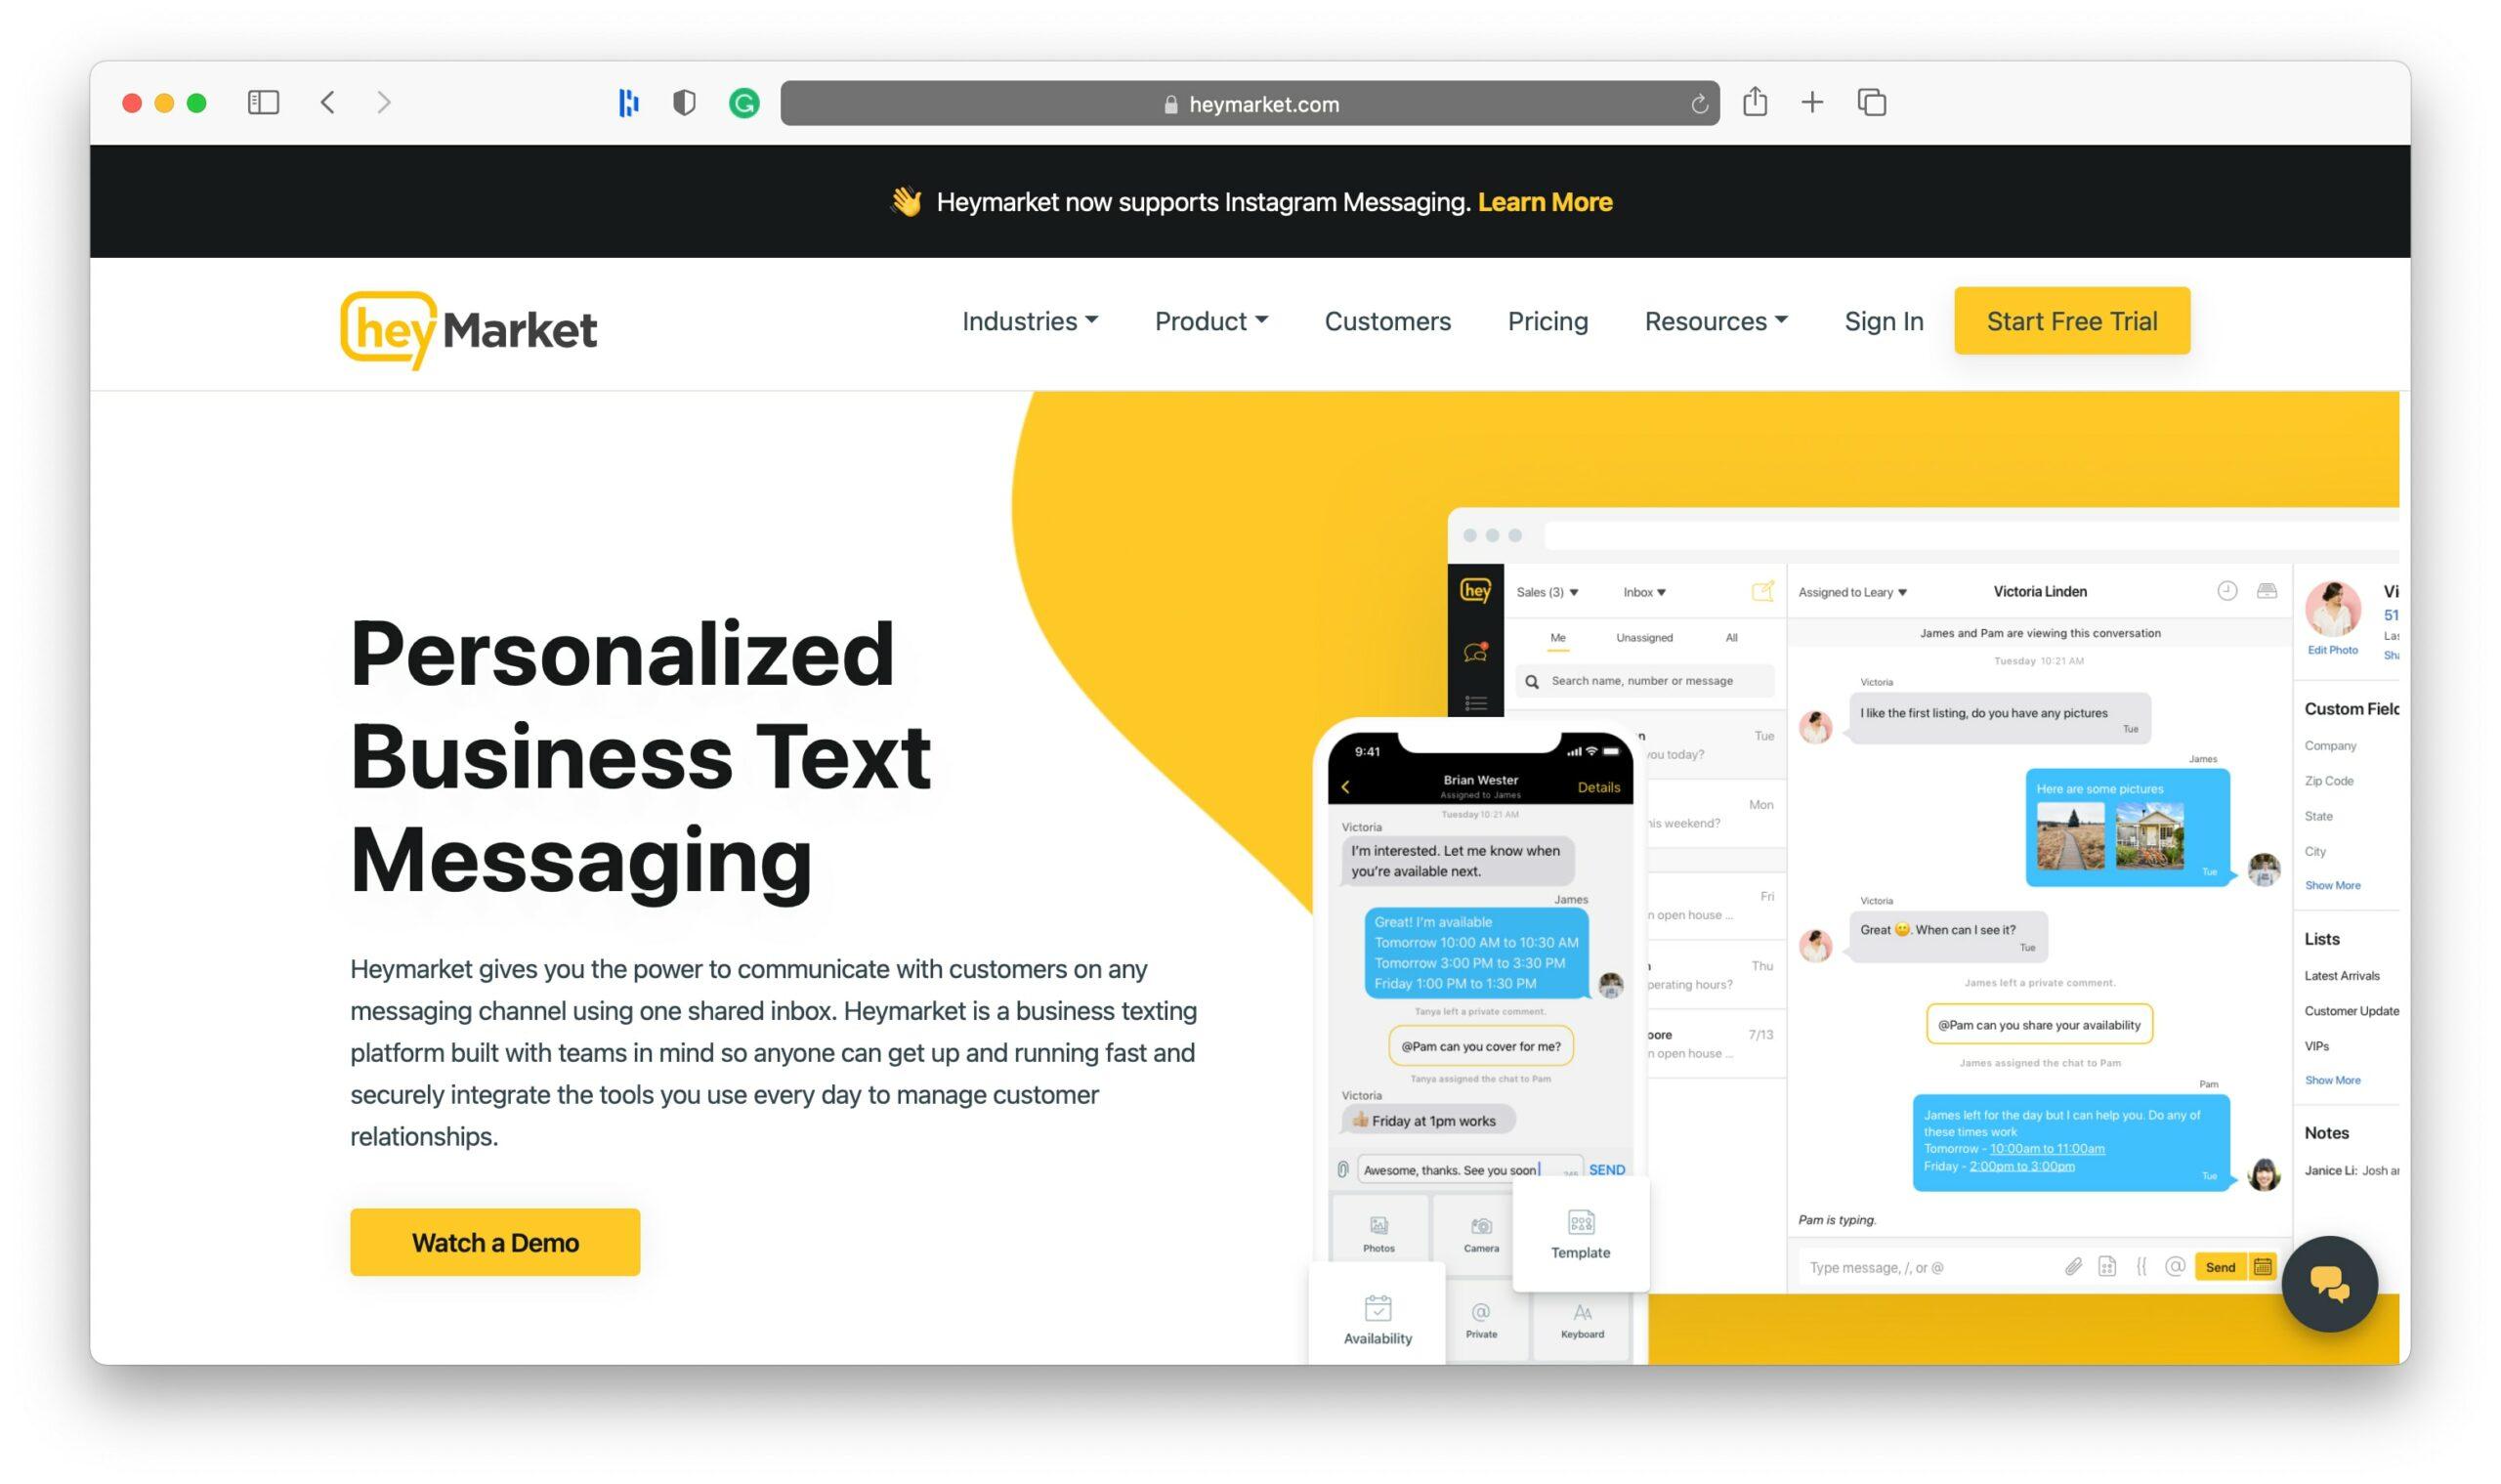 HeyMarket SMS Marketing Tools